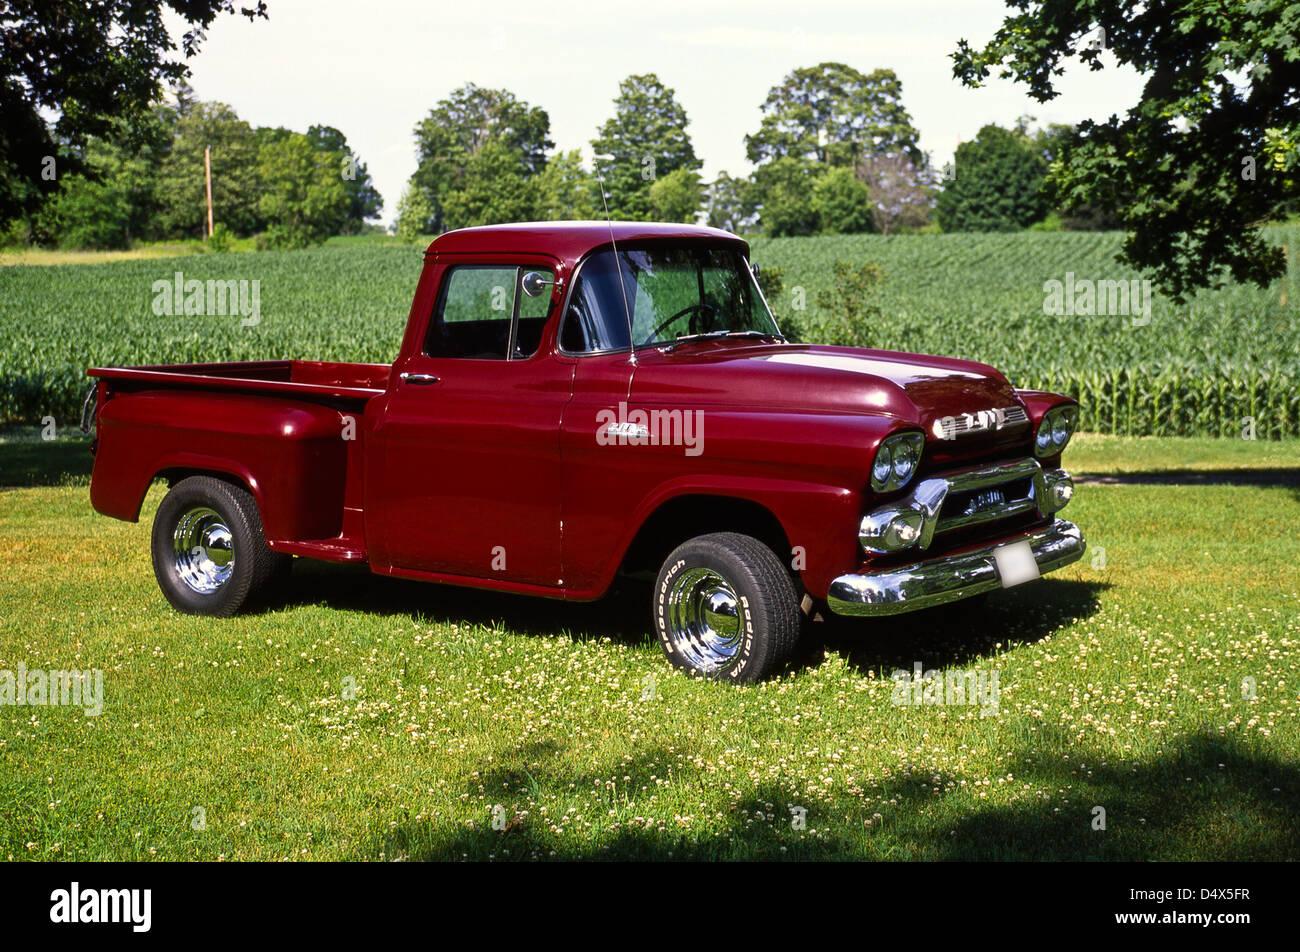 1959 Gmc General Motors Company Model 9310 Pick Up Truck Stock Photo